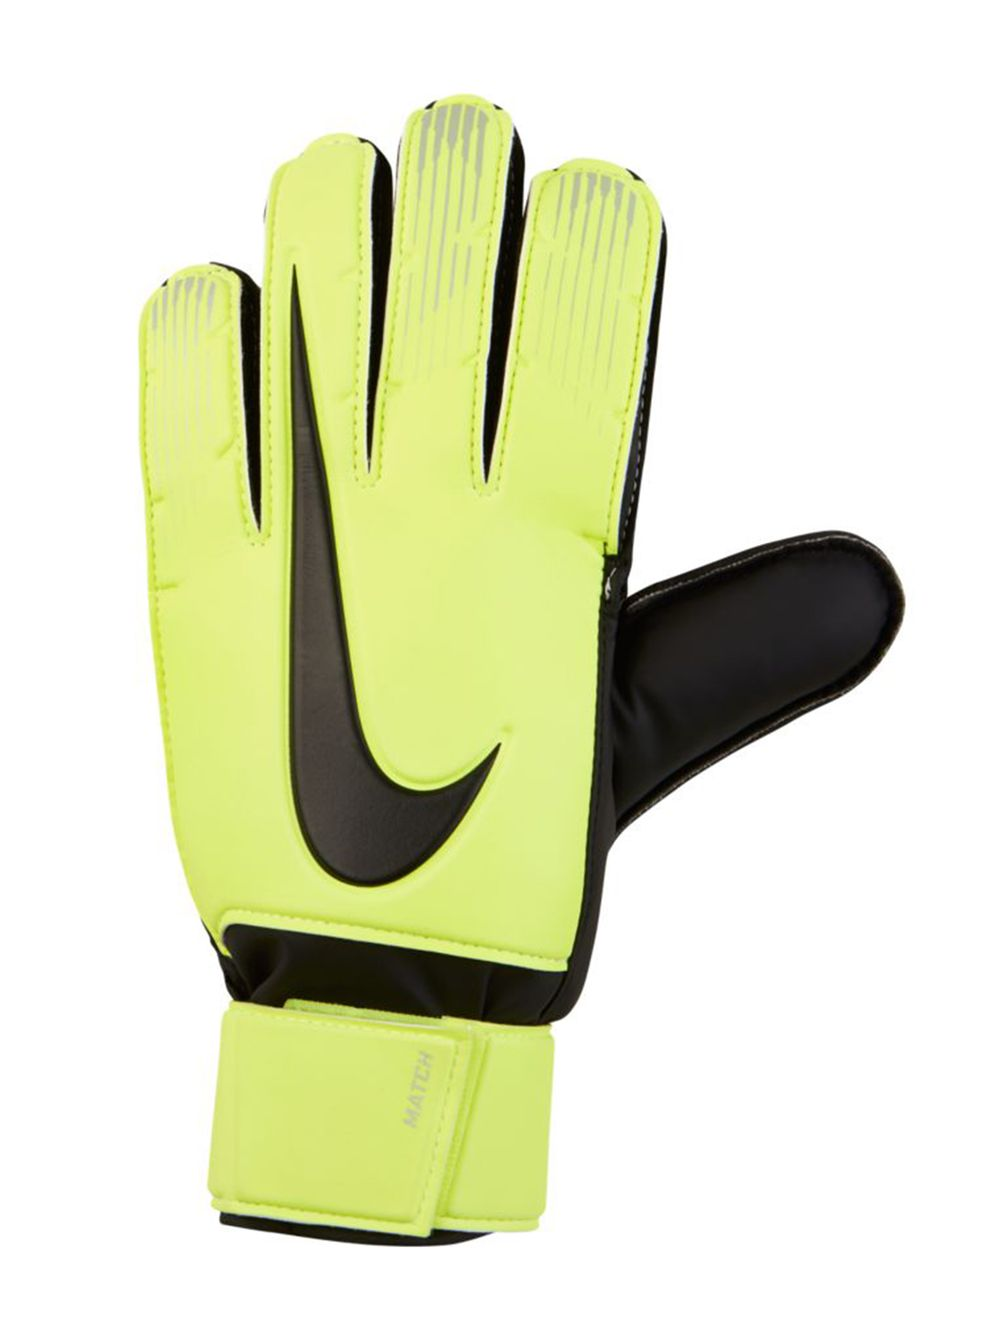 c81e7b012 Luva De Goleiro Nike Match Goalkeeper Amarelo - pittol